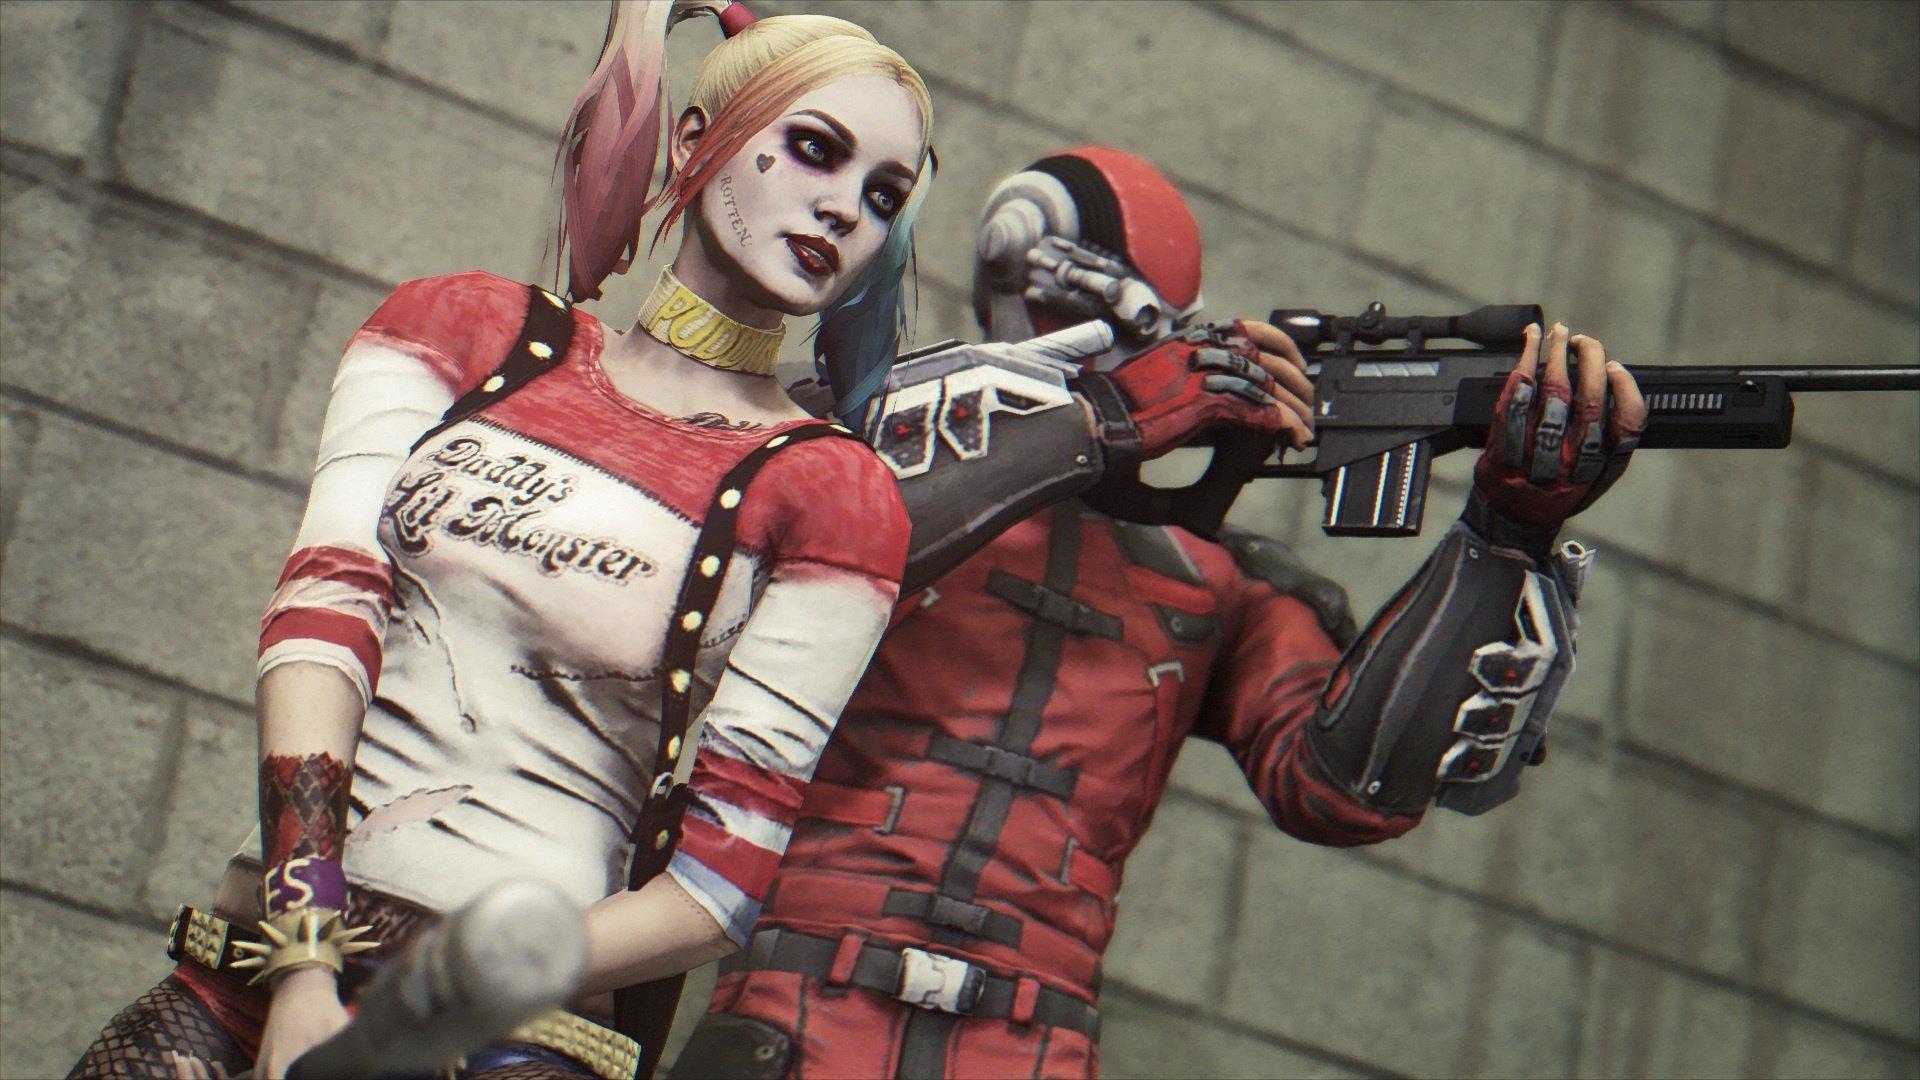 Harley Quinn Injustice 2 Add On Ped Replace Gta5 Modscom